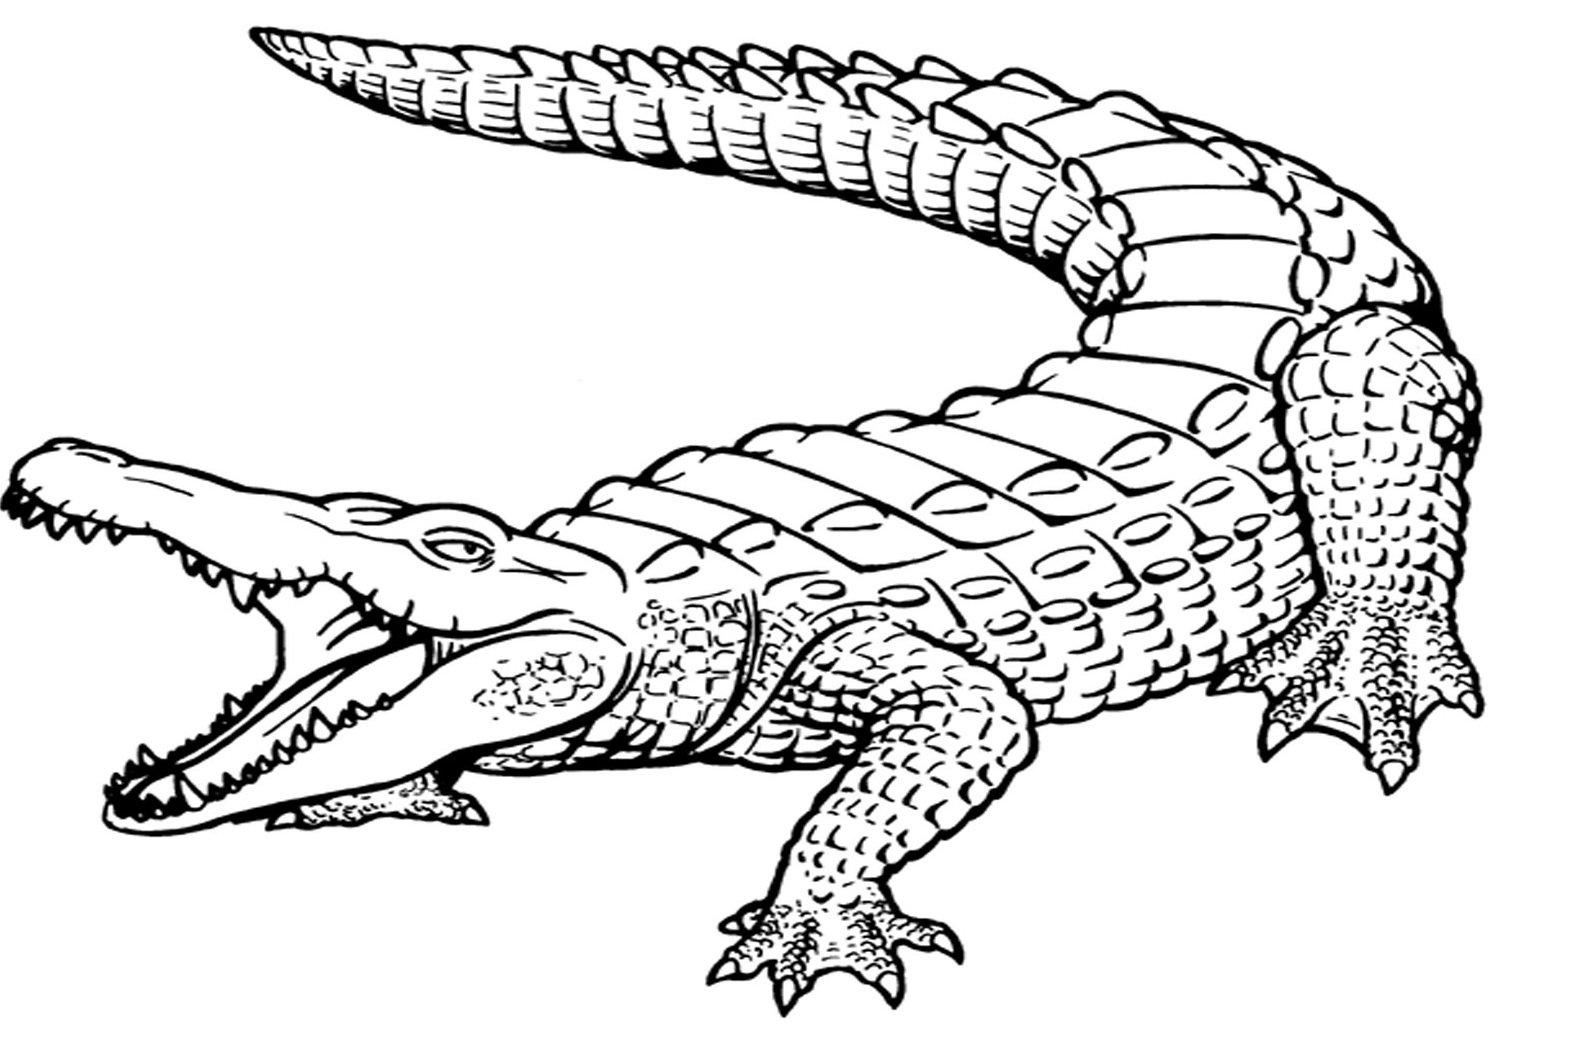 crocodile pictures to color crocodile coloring pages to print pictures to crocodile color